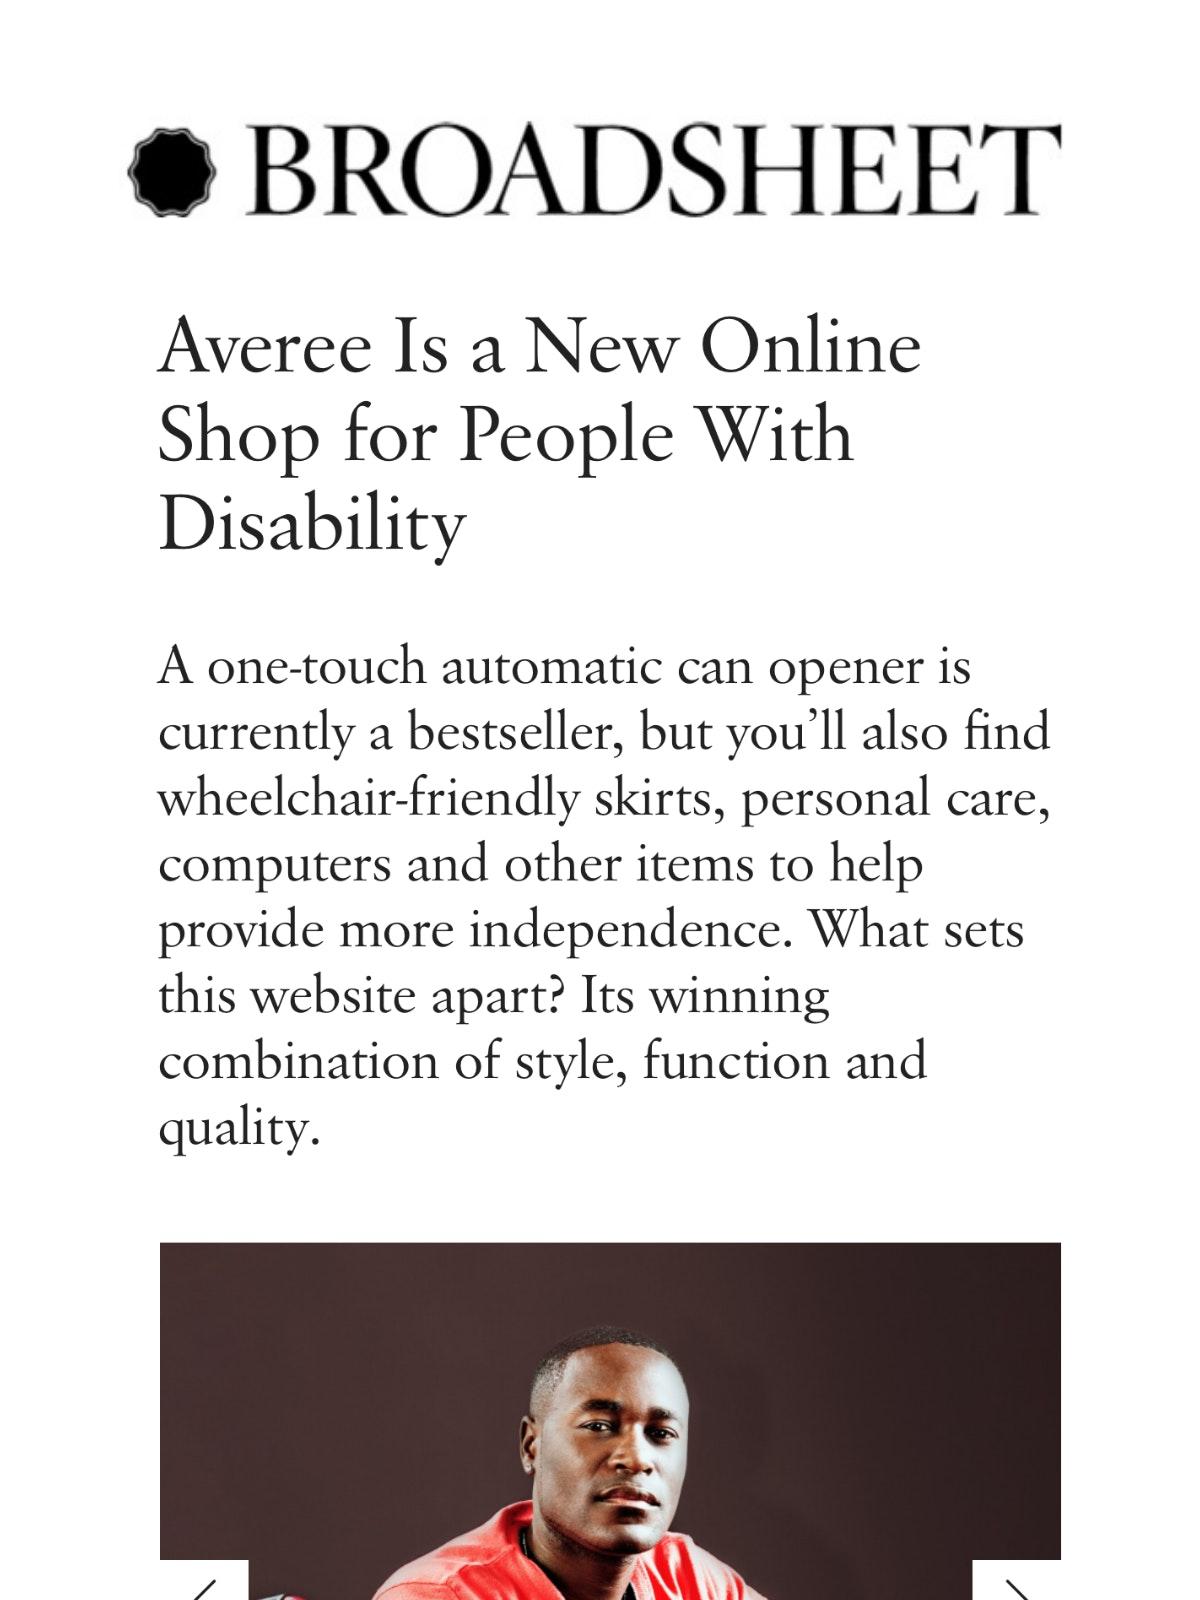 A screenshot of Broadsheet article